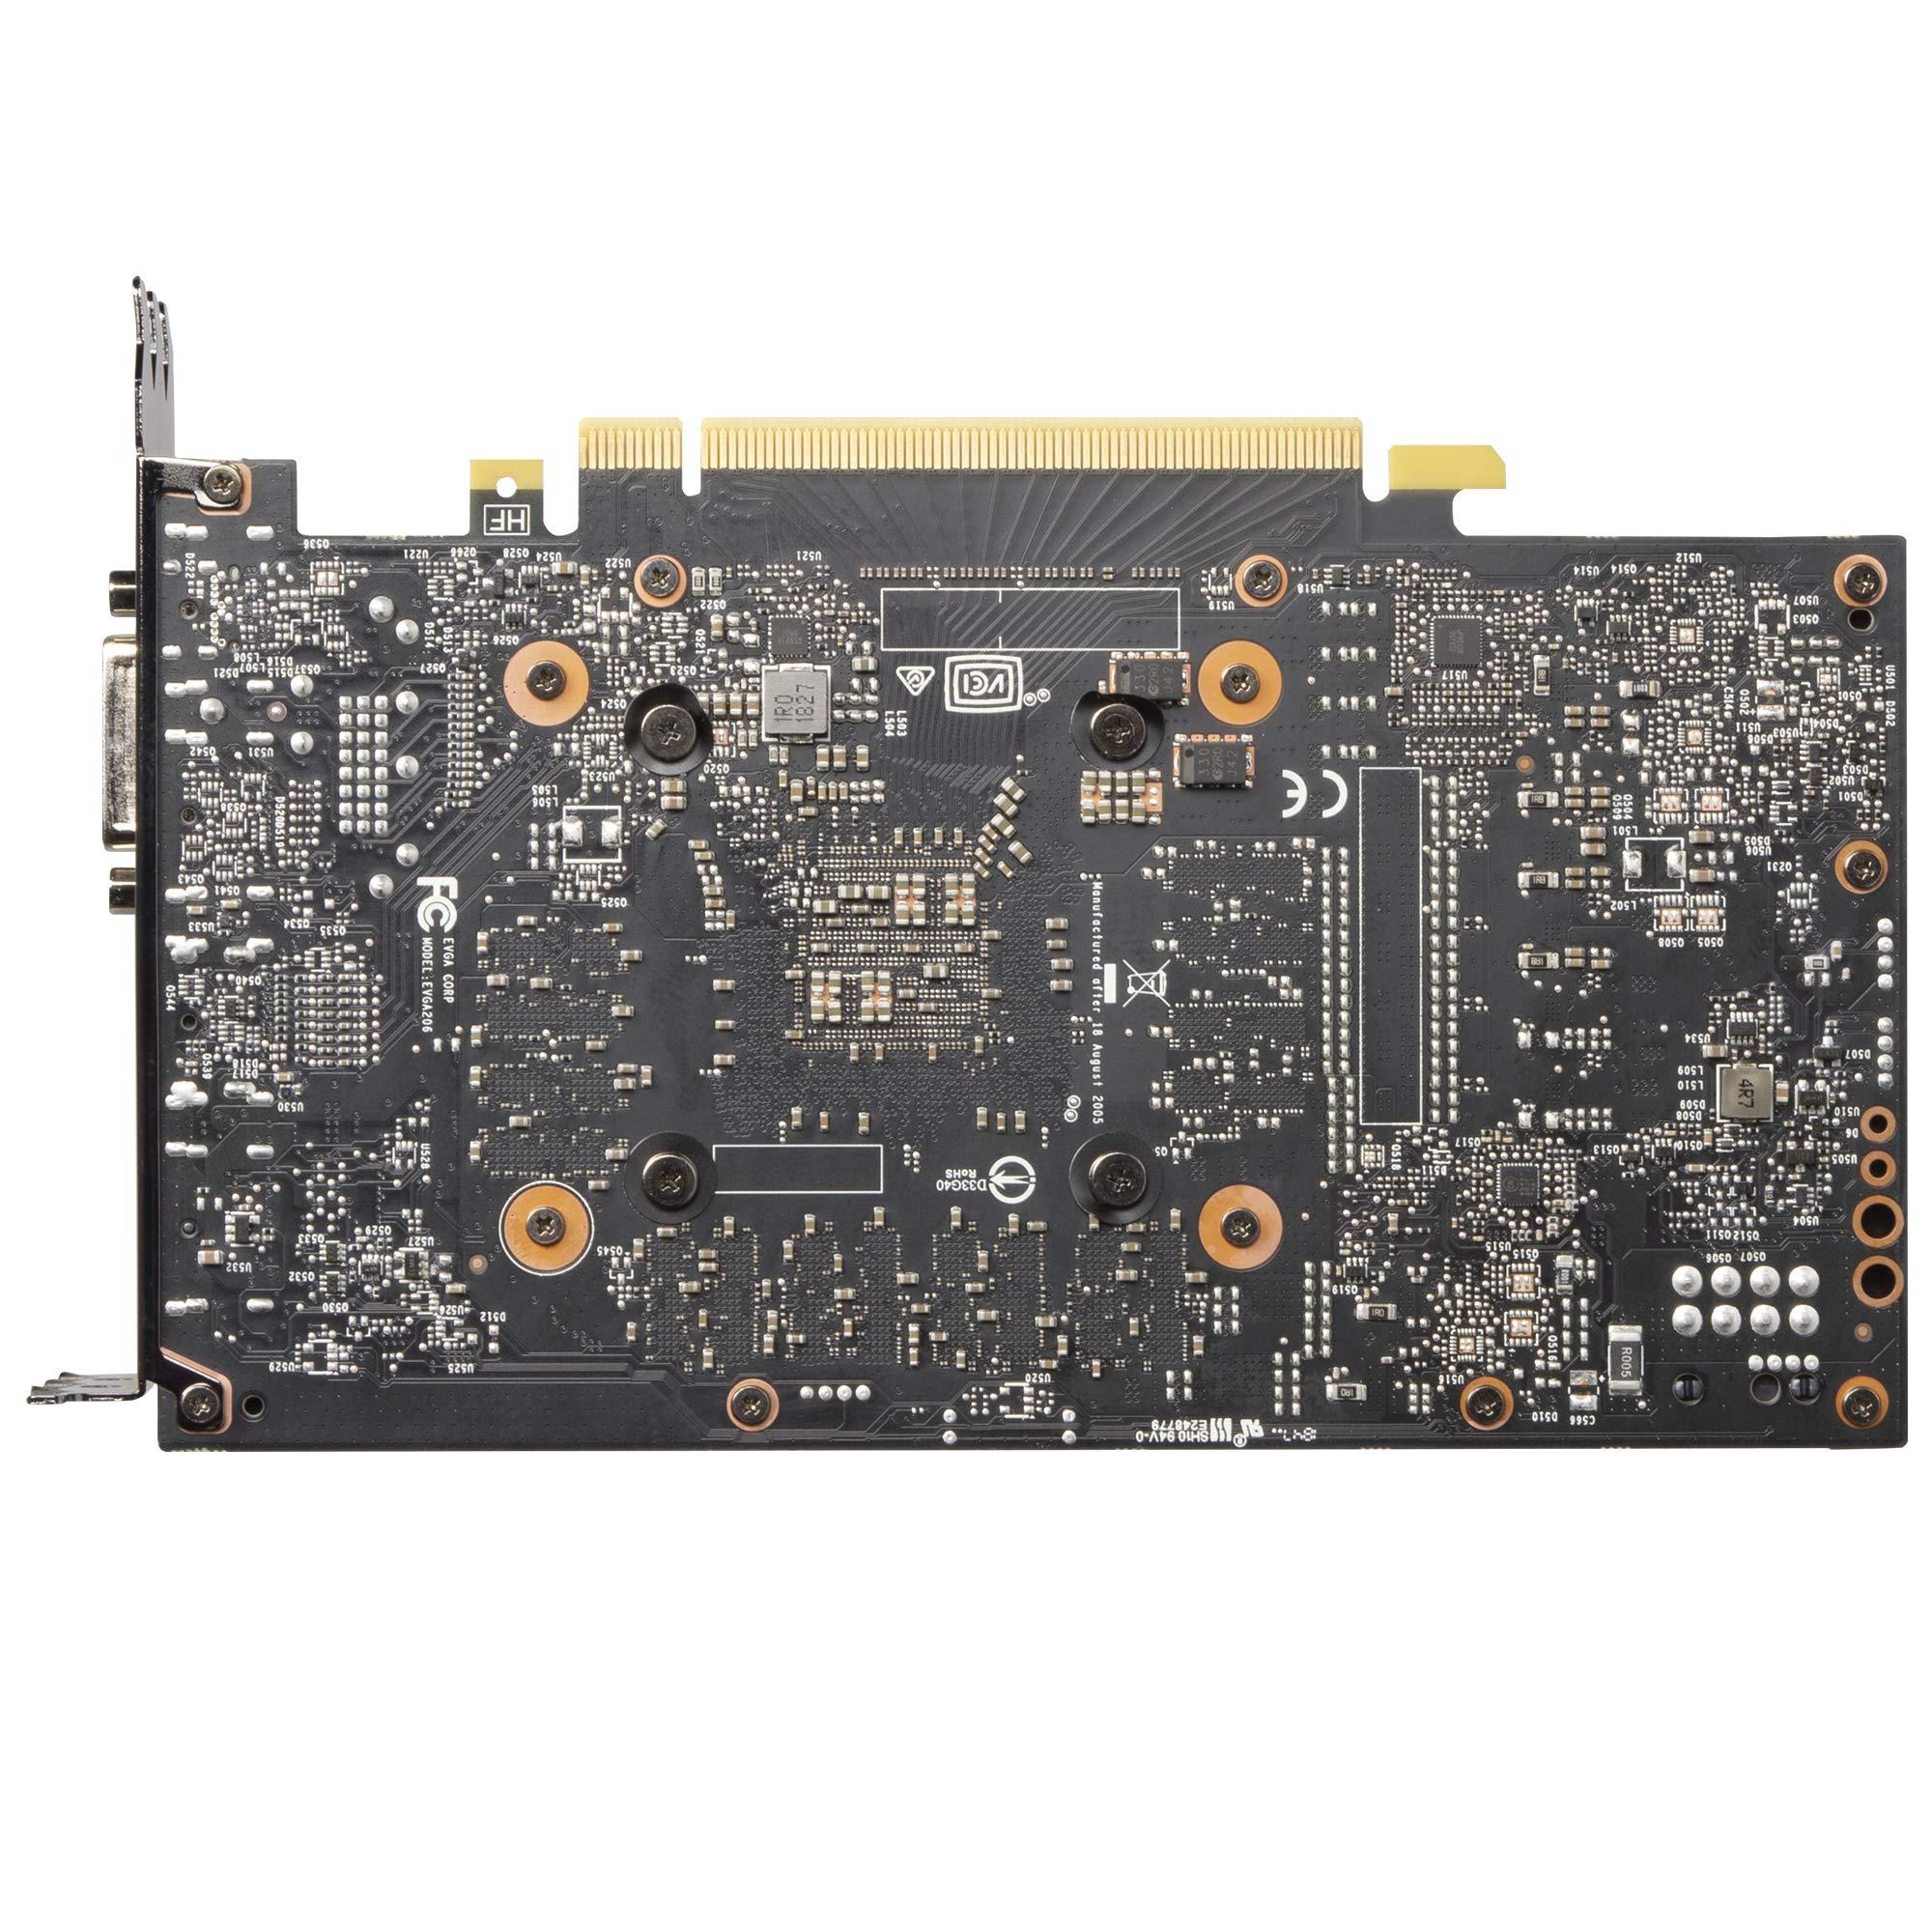 EVGA GeForce GTX 1660 Ti XC Black Gaming, 6GB GDDR6, HDB Fan Graphics Card 06G-P4-1261-KR by EVGA (Image #7)